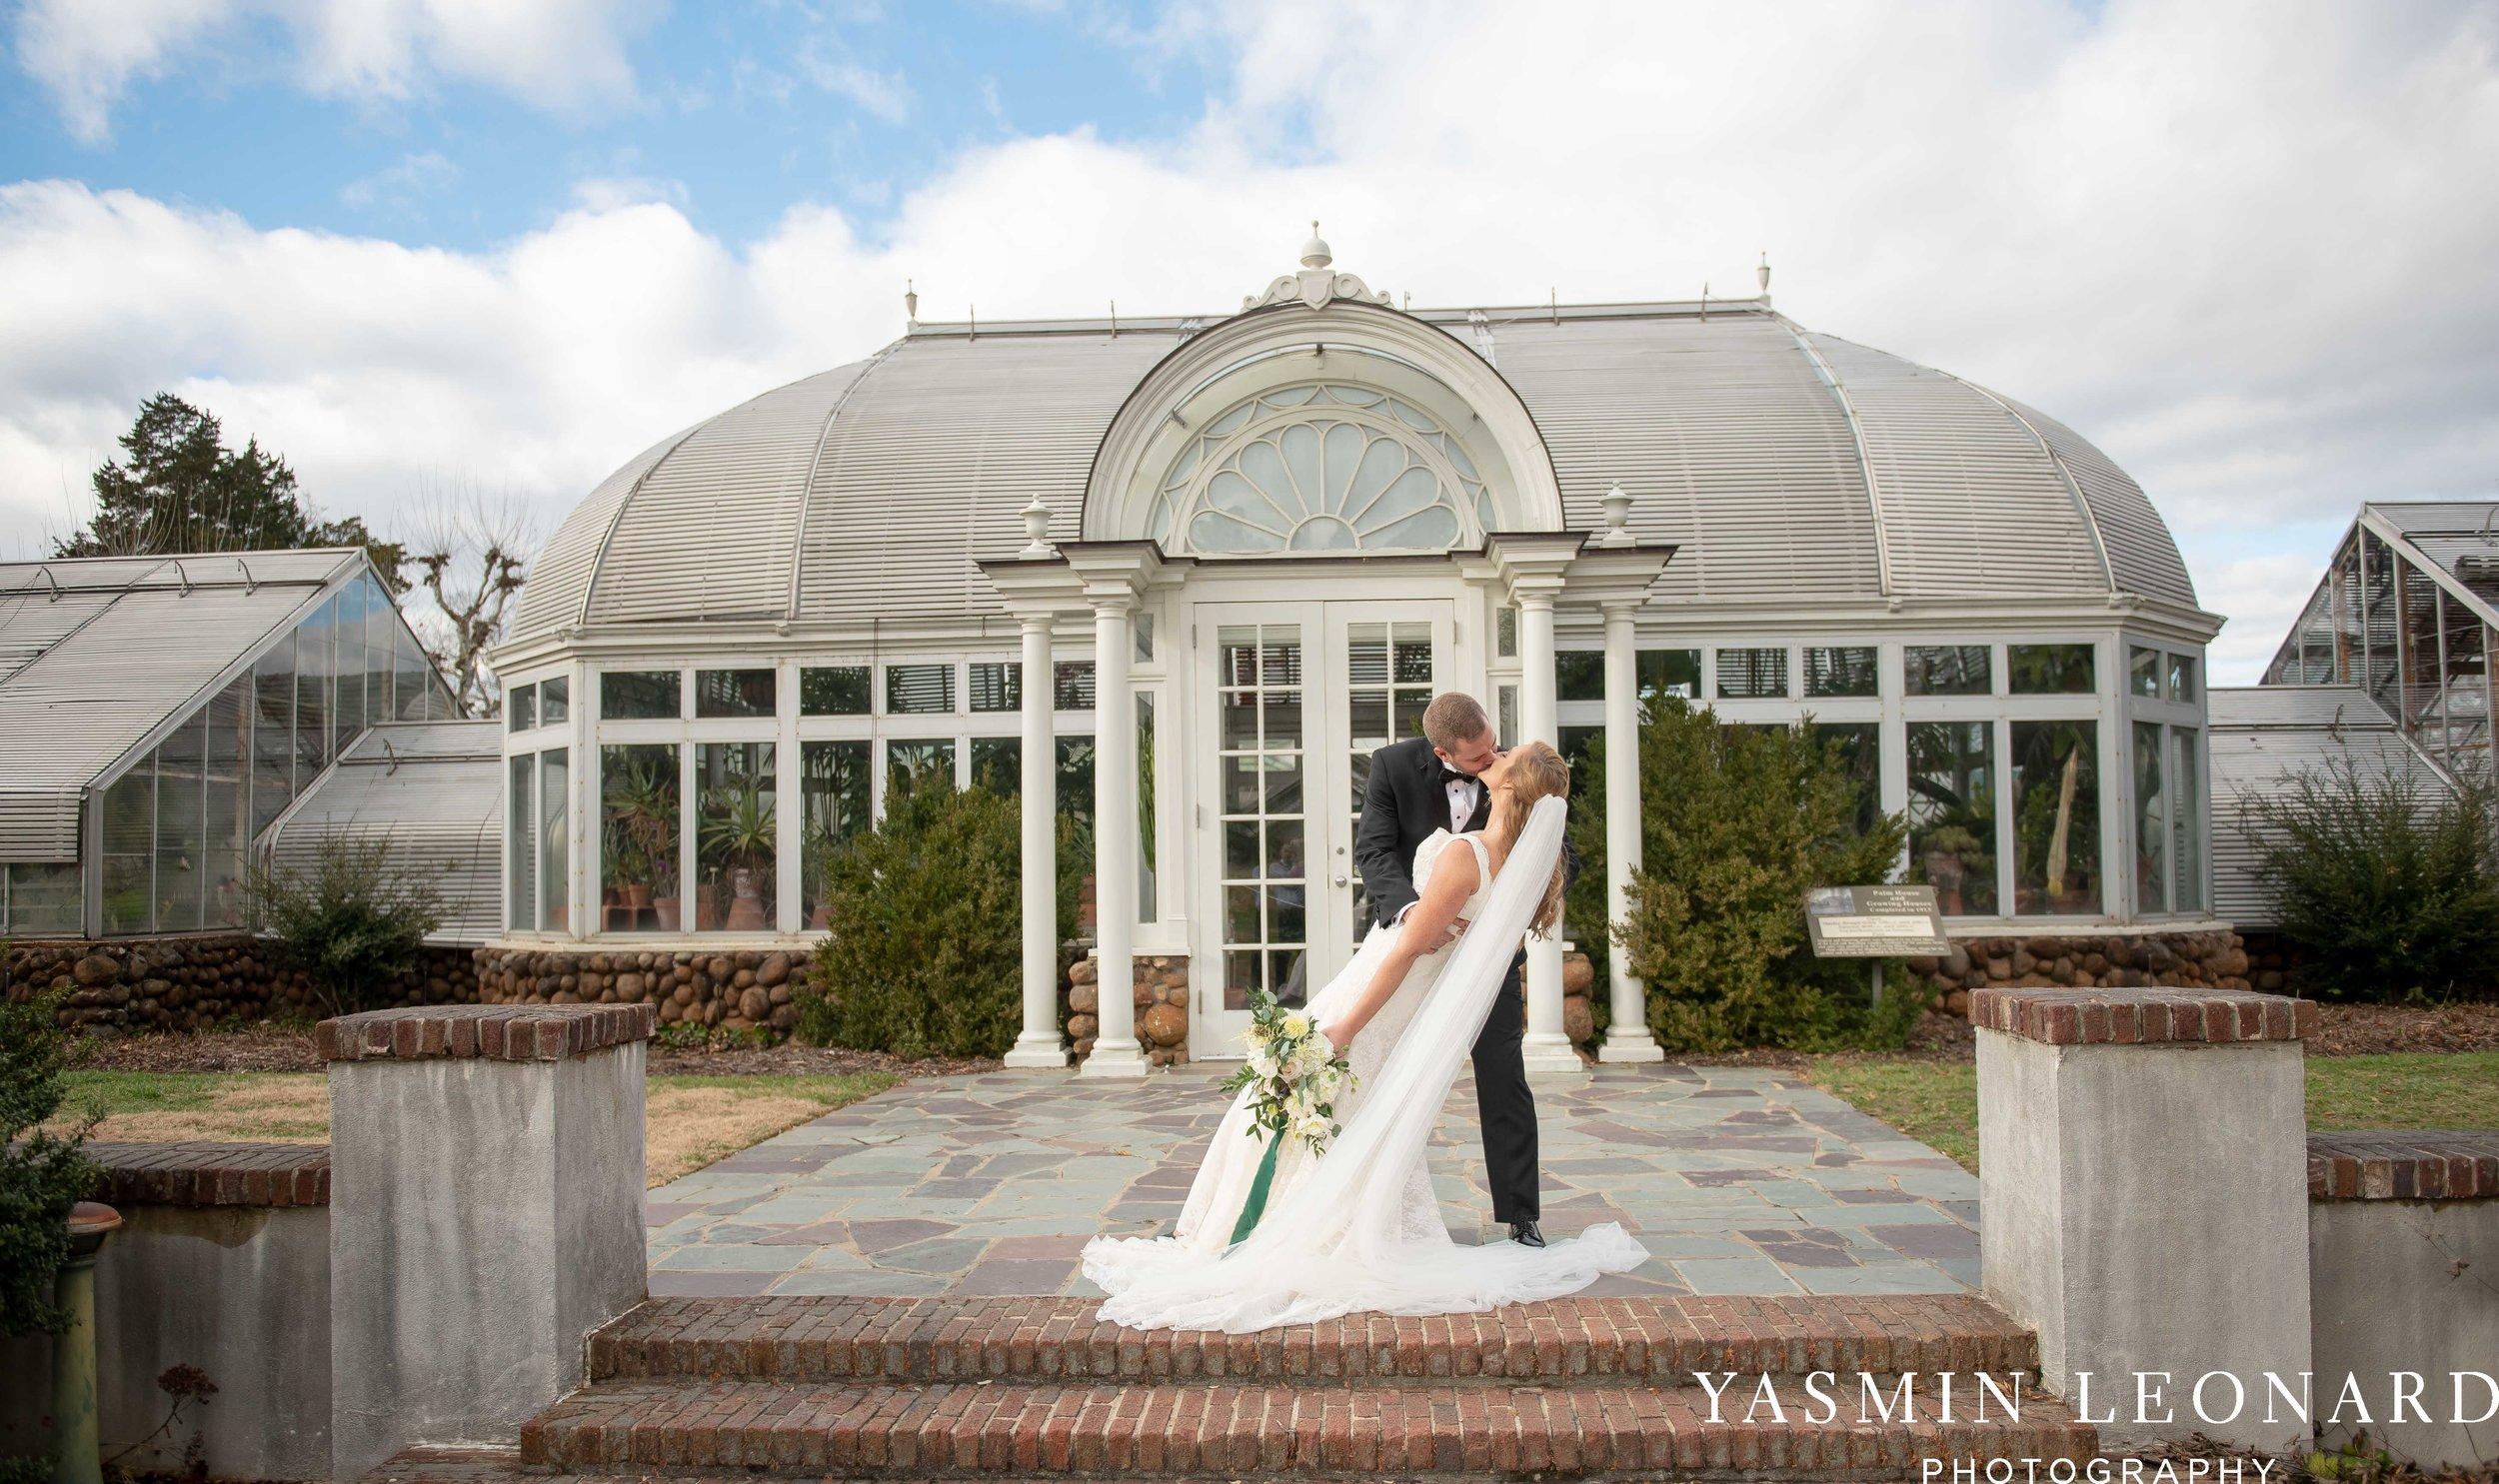 Barn at Reynolda Village - Winston Salem Wedding - White and Green Wedding - NC Wedding - NC Barns - Yasmin Leonard Photography-22.jpg